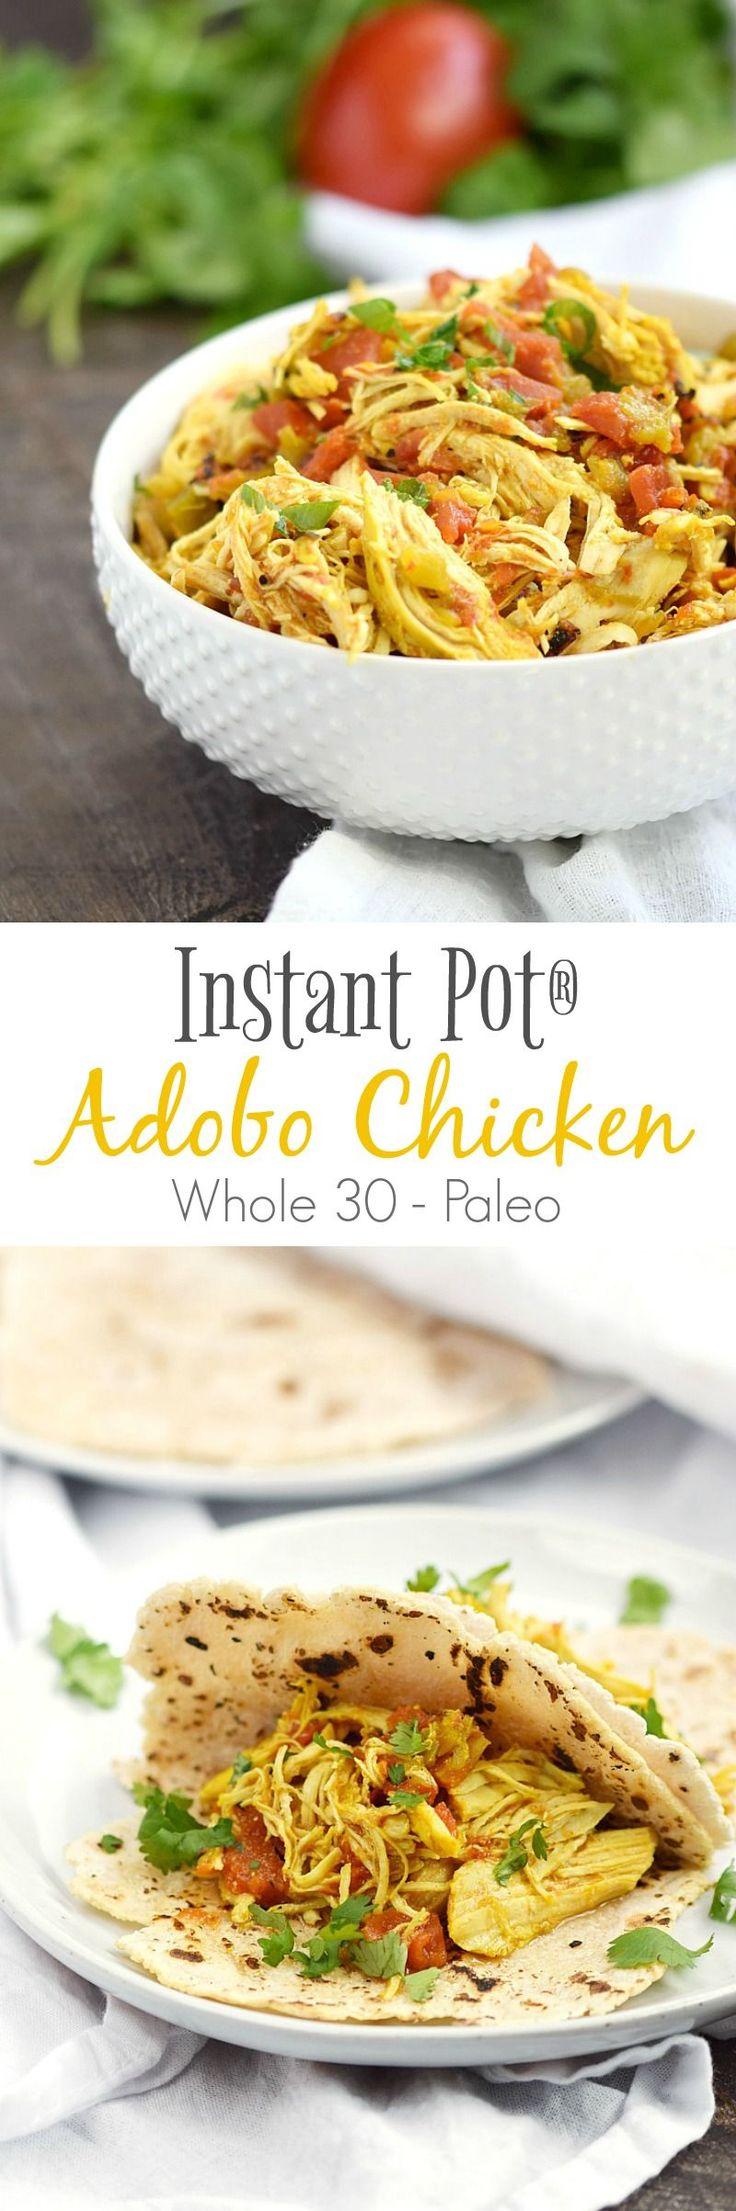 Instant Pot Adobo Chicken